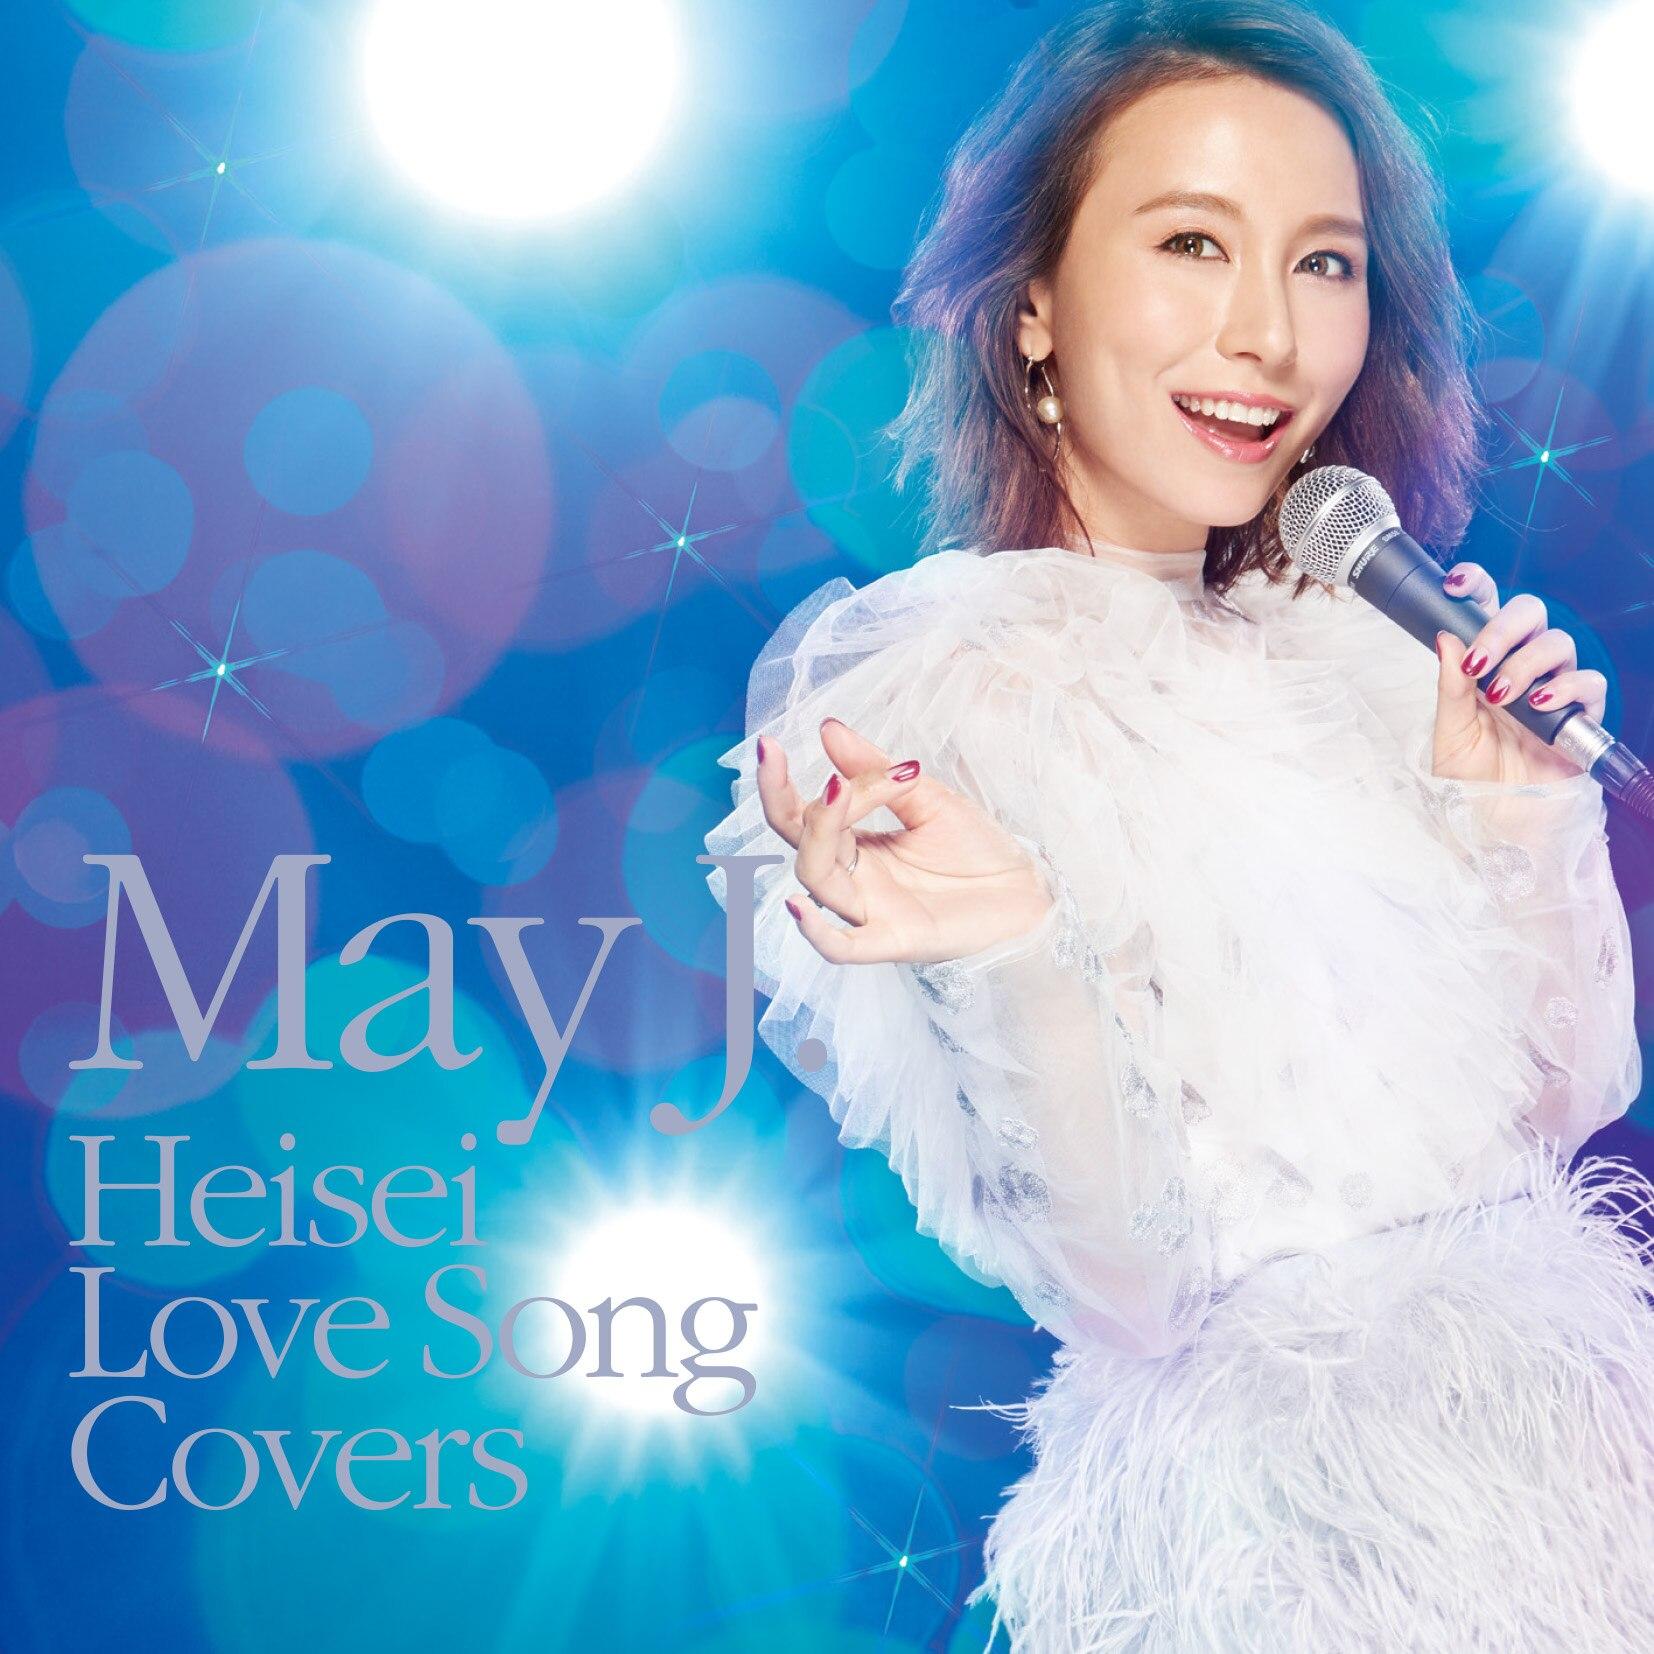 [CDアルバム] 平成ラブソングカバーズ supported by DAM 2019-04-17 RZCD-86828 ¥3,240(税込)